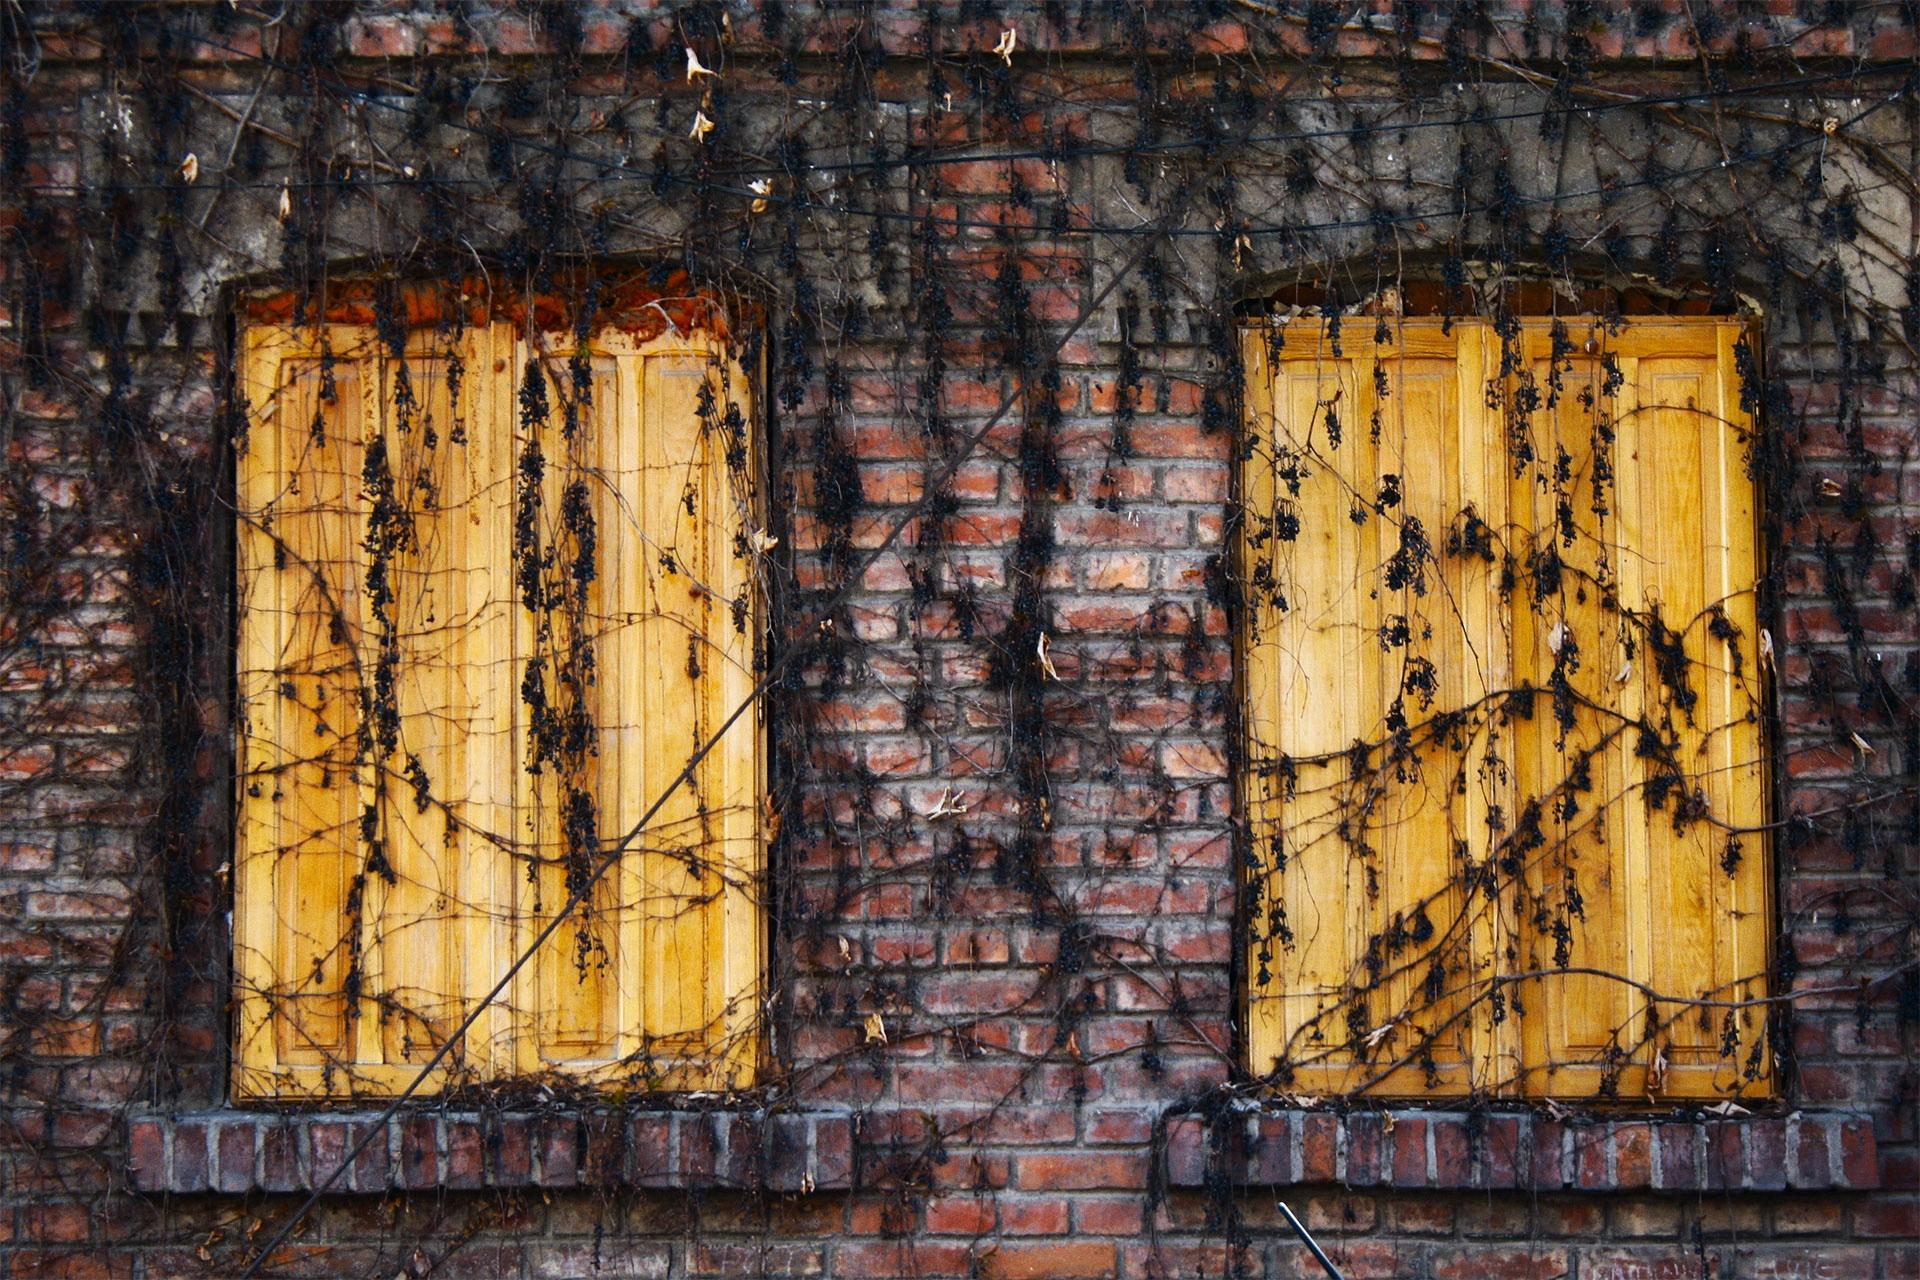 vines overgrowing shuttered windows